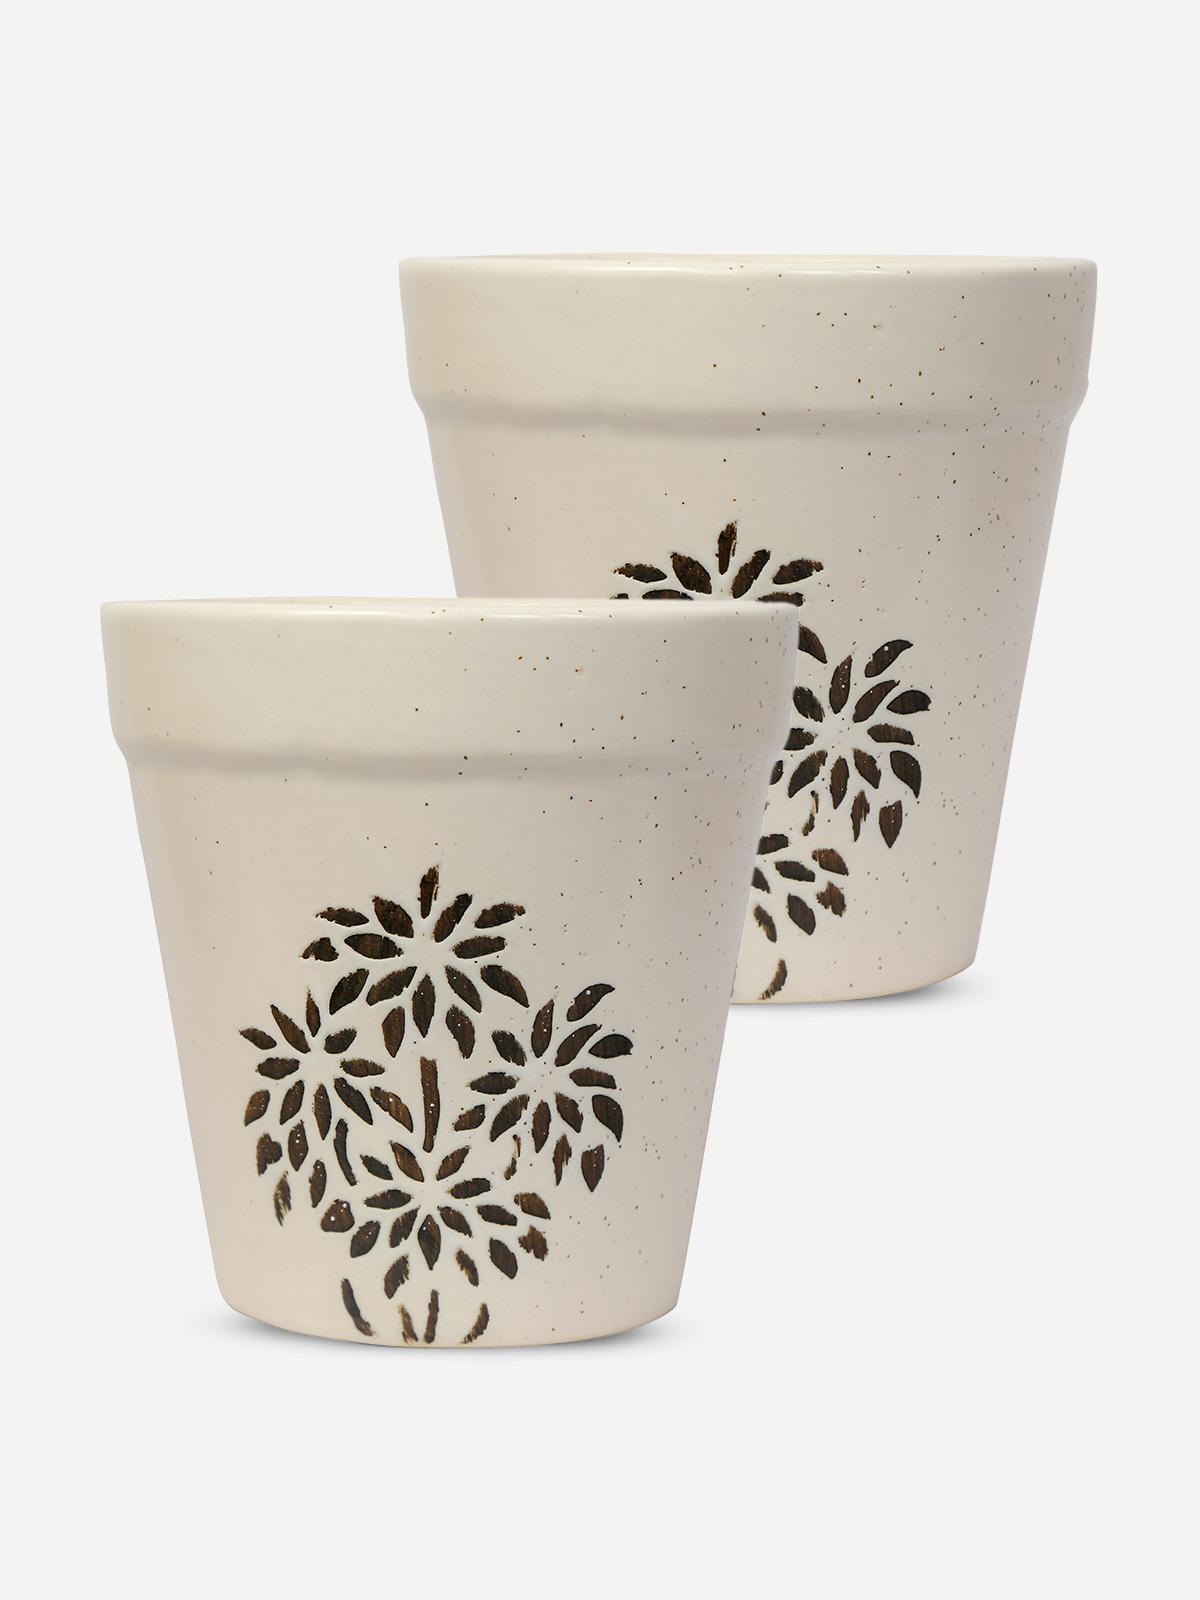 Buy Printed Ceramic Plant Pots Set Of 2 For Men Online At Best Price Cloudnursery